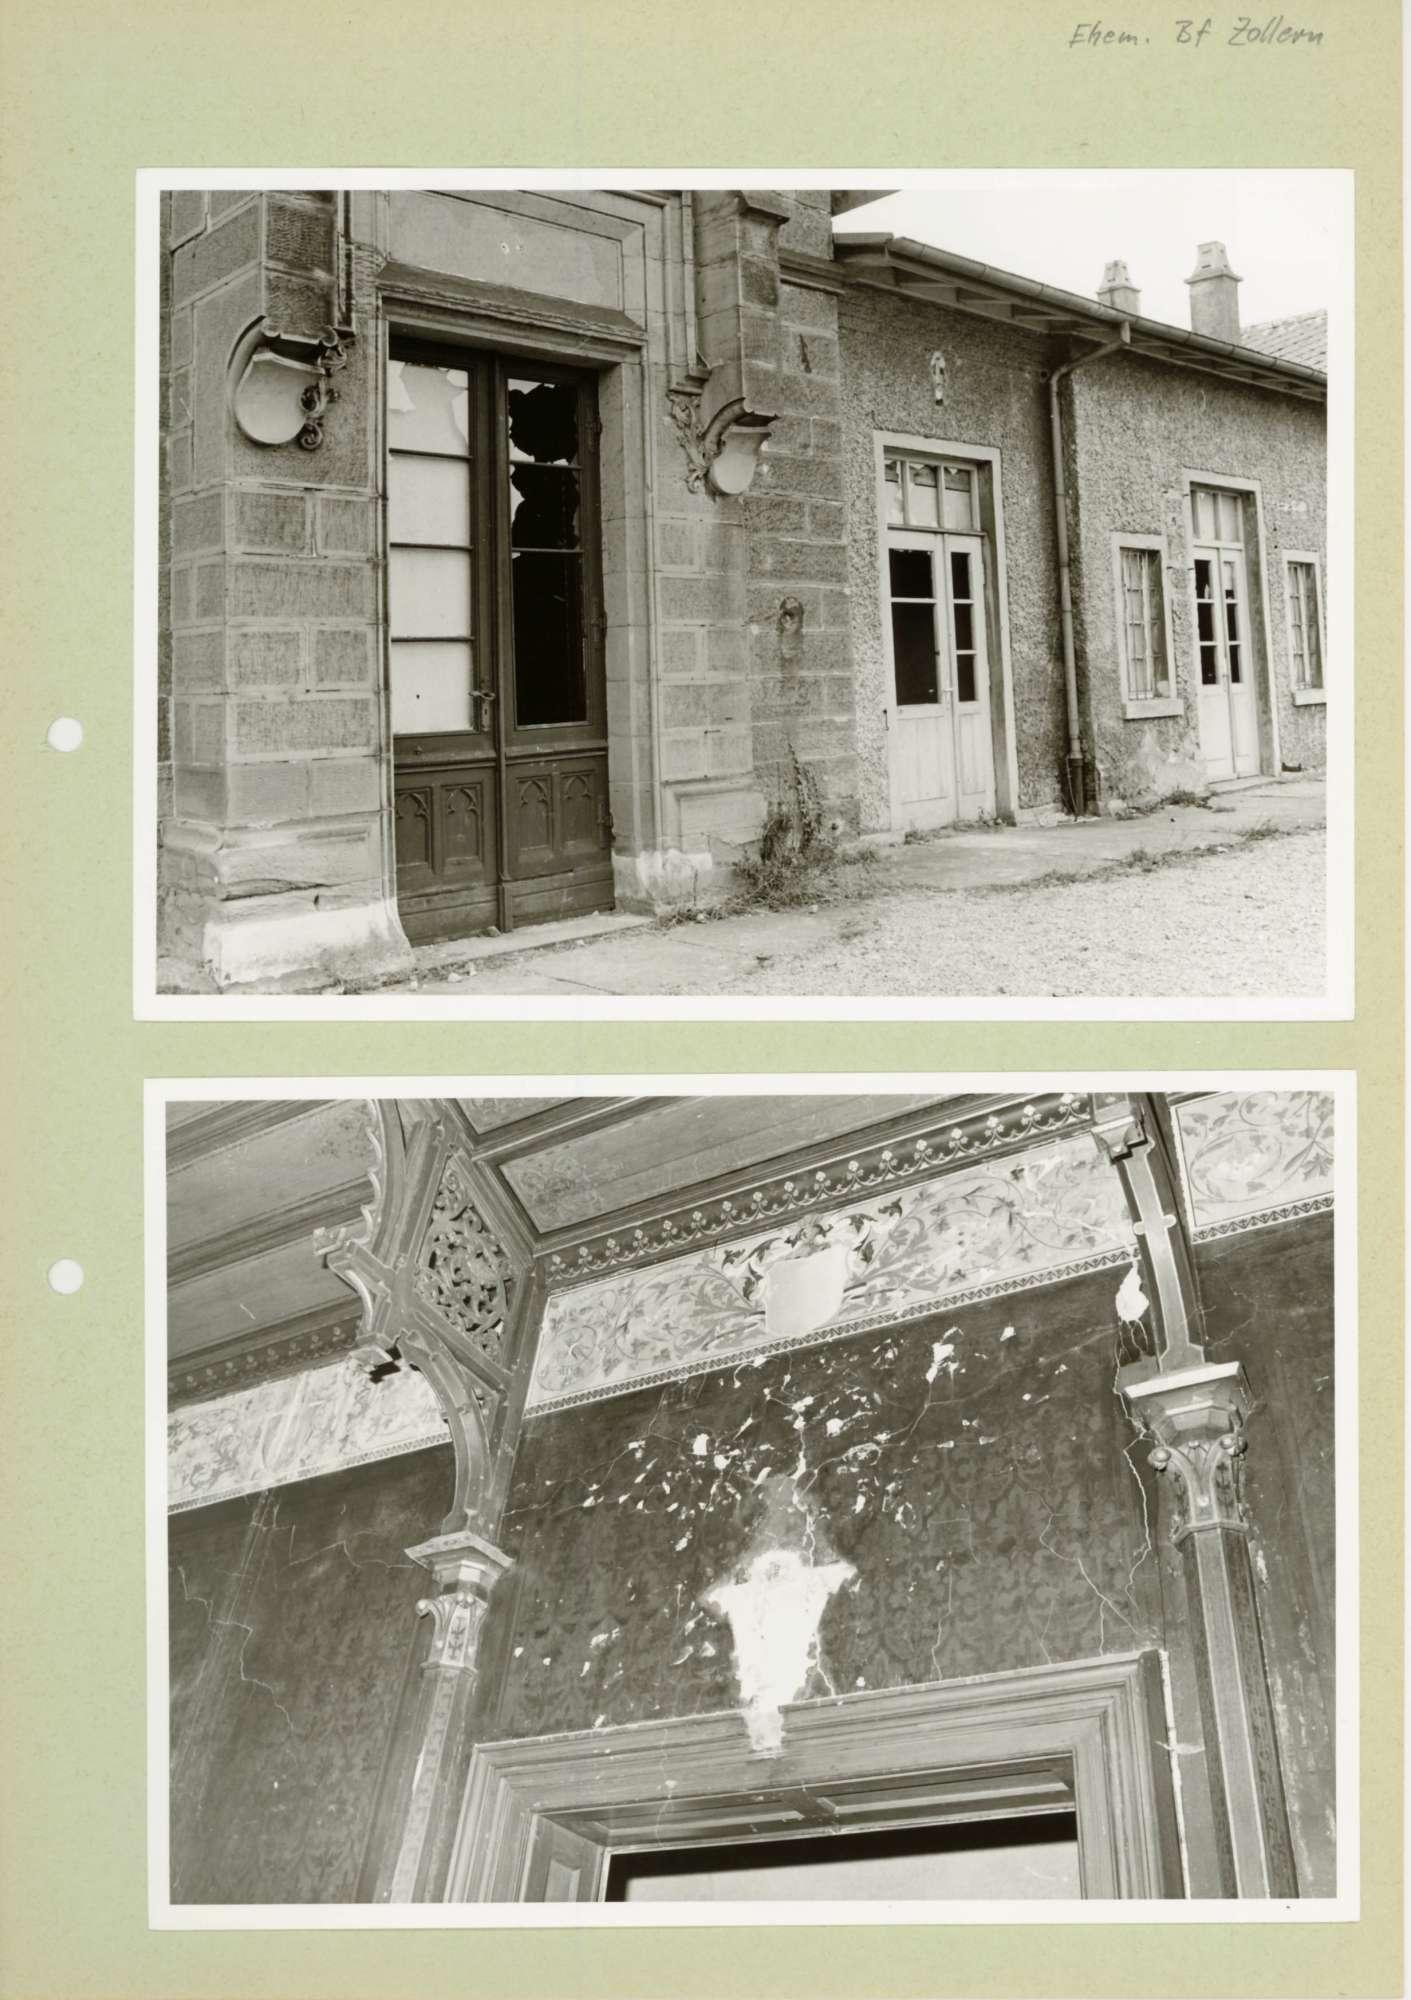 Zollern (ehemaliger Bf): 12 Fotos, Bild 3